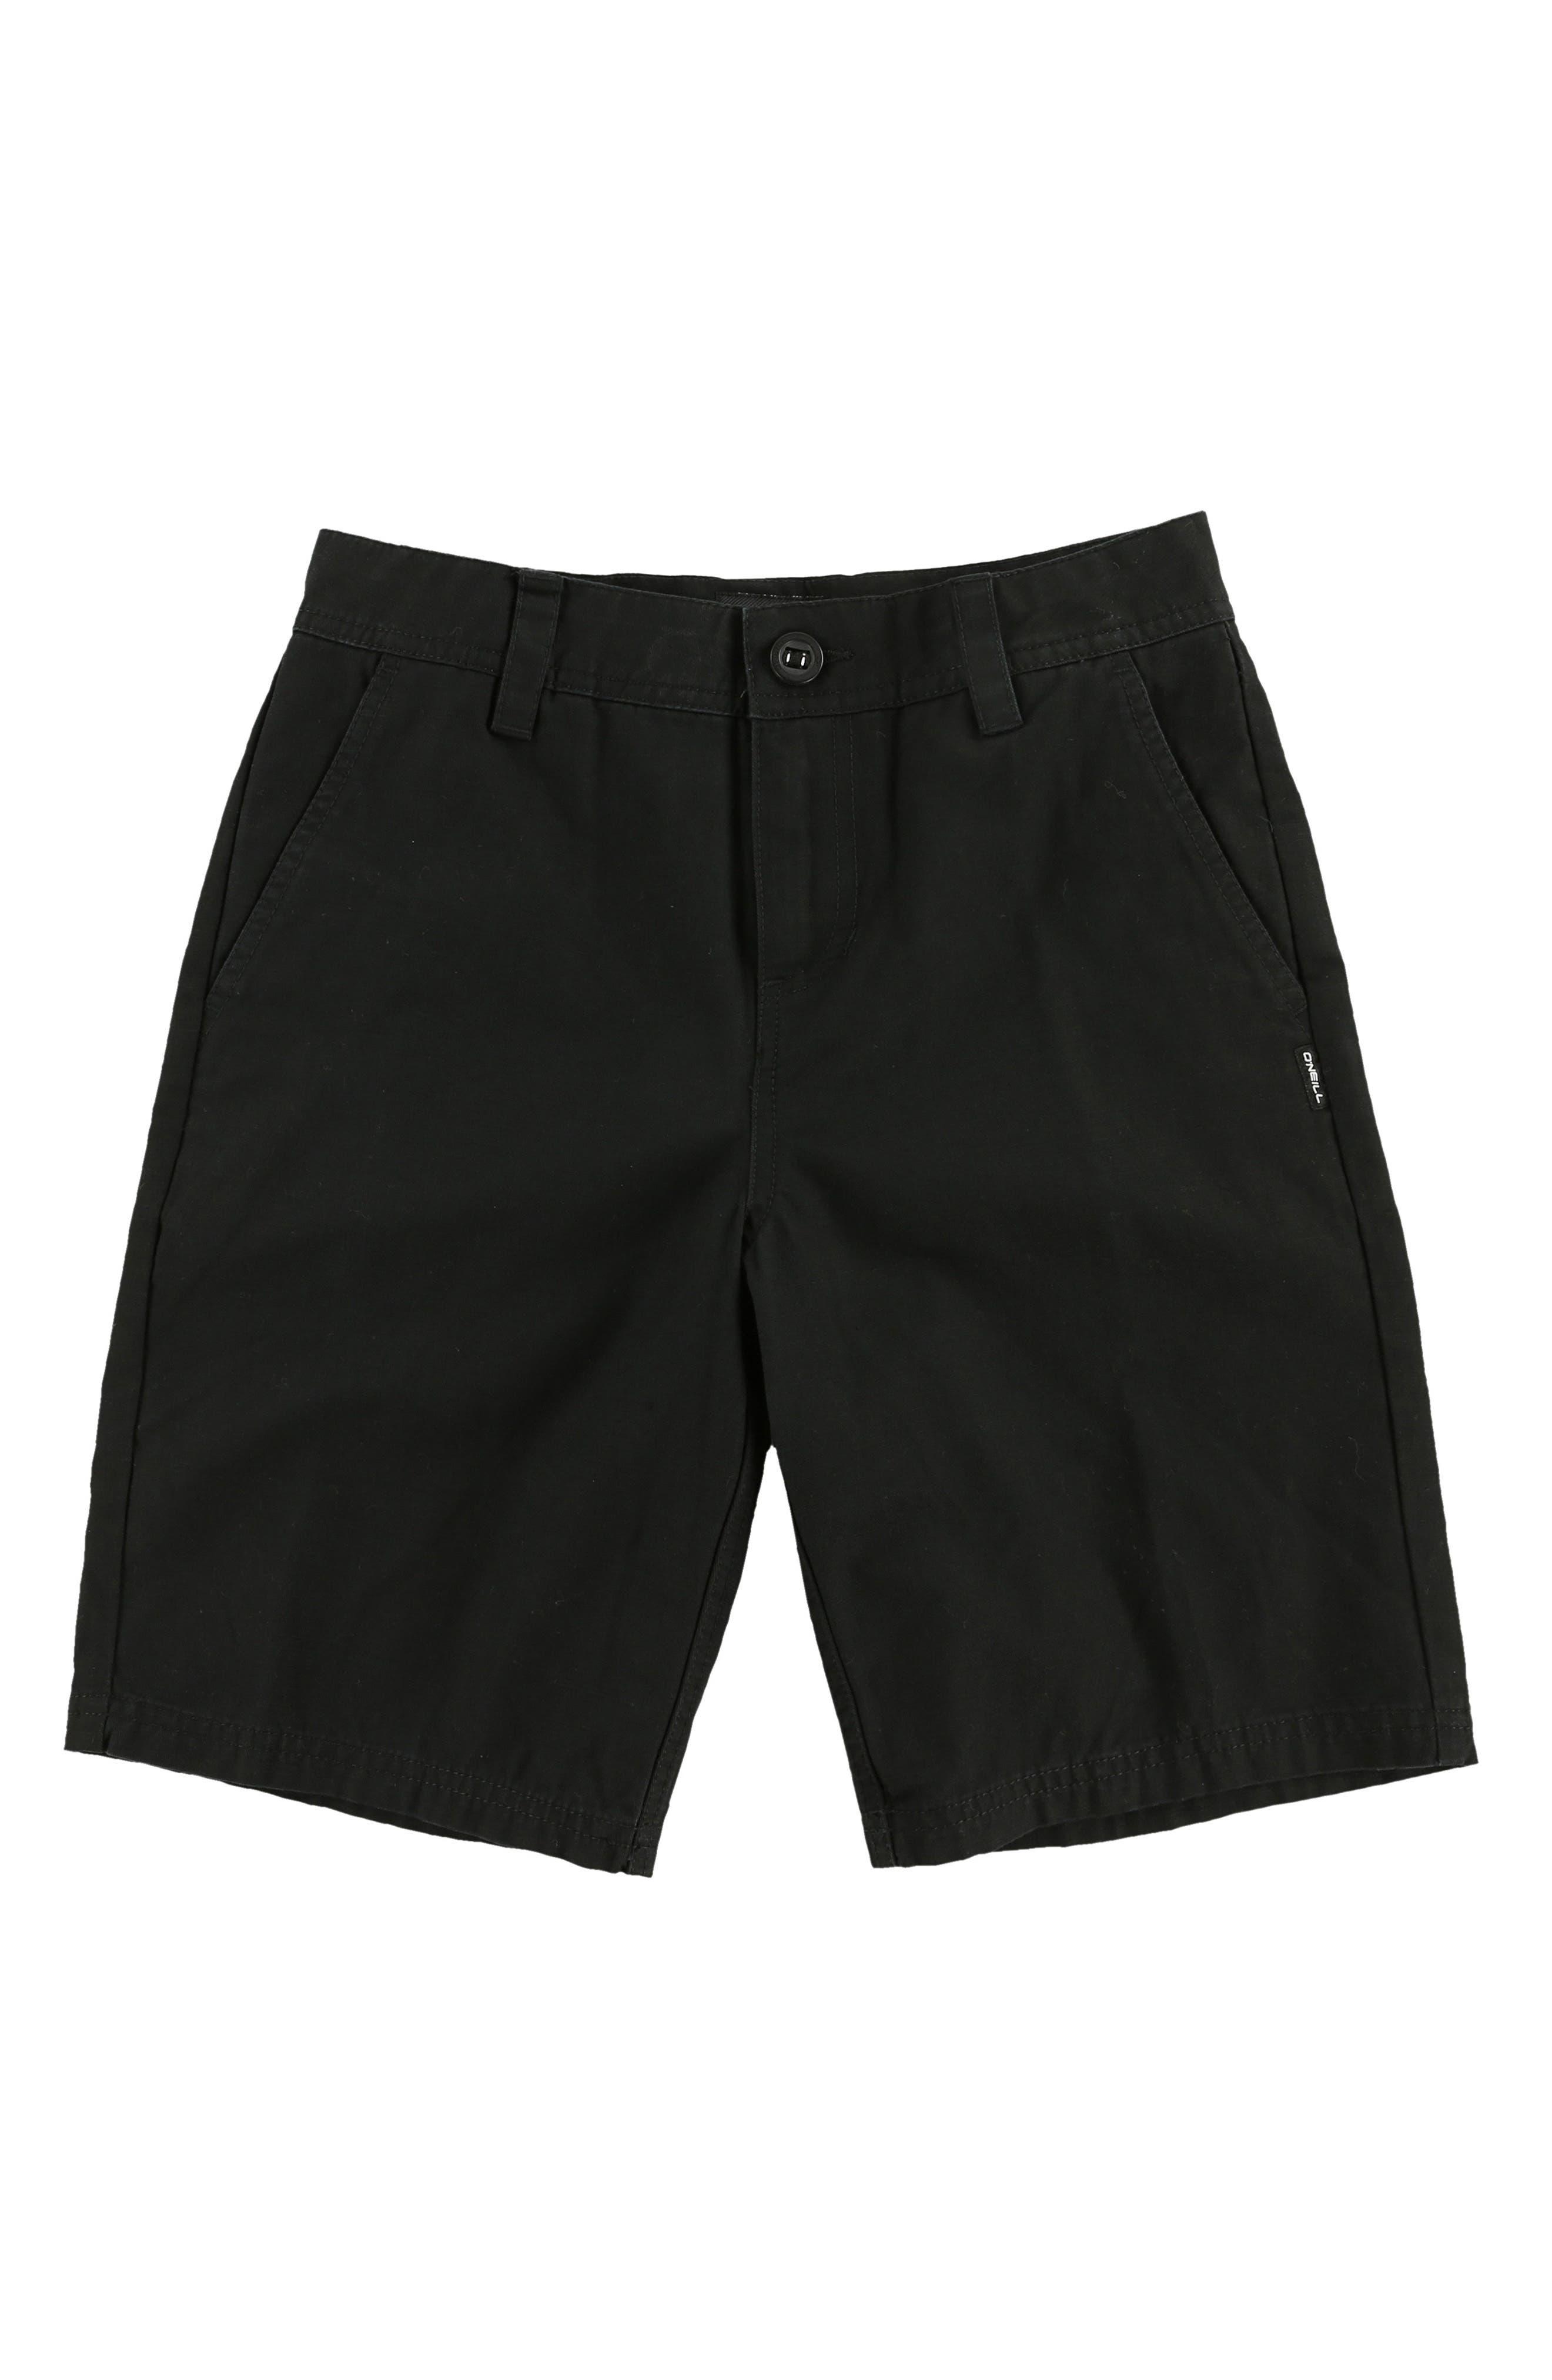 O'NEILL,                             Jay Chino Shorts,                             Main thumbnail 1, color,                             001